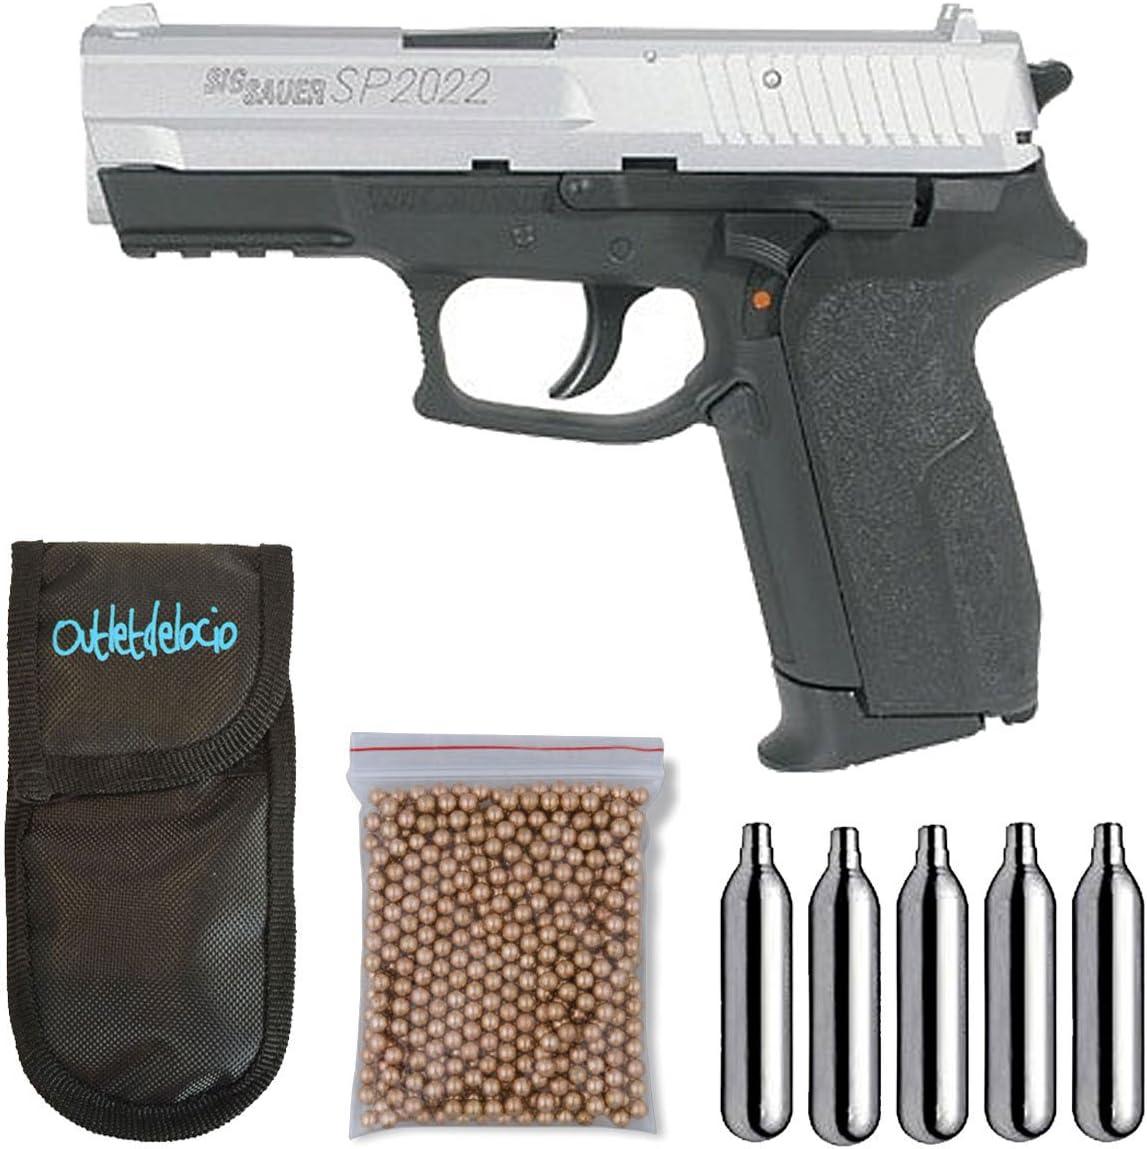 Pack pistola Perdigón Sig Sauer SP2022, corredera metalica. Calibre 4,5mm BBS. + Funda Portabombonas + Balines + Bombonas co2